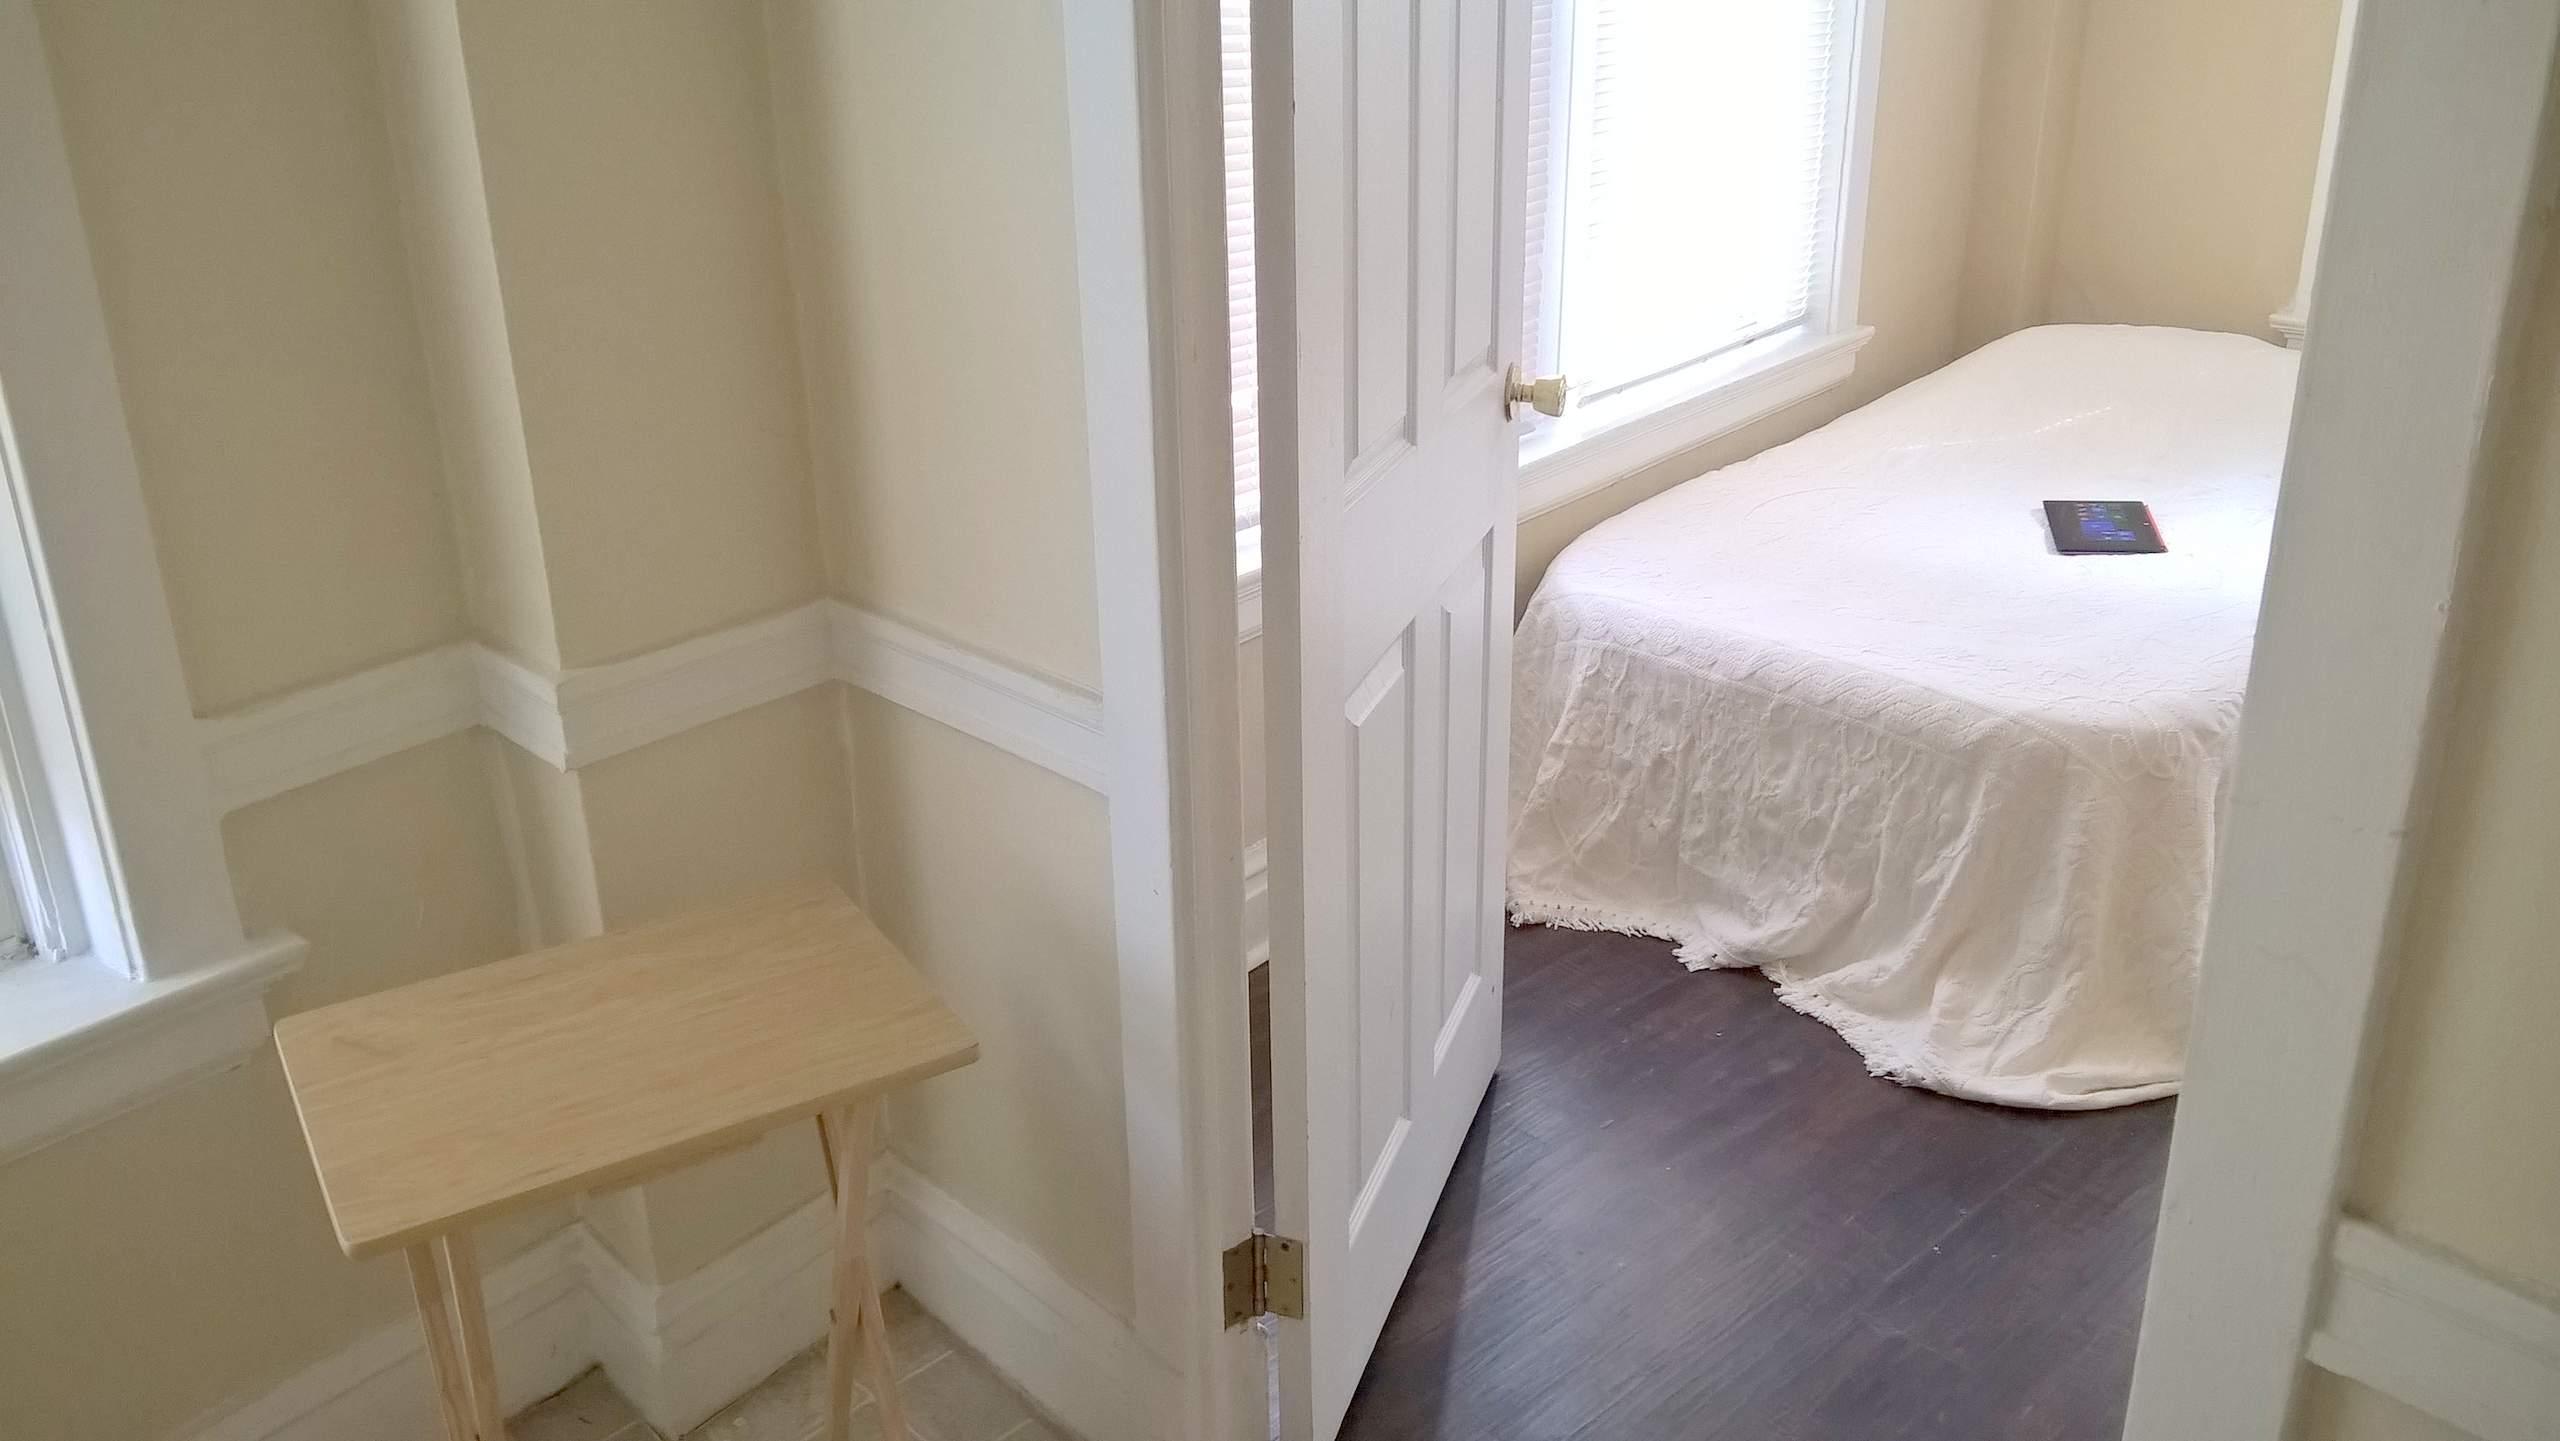 my minimalist apartment glasses tv tray white twin airbed minimalist